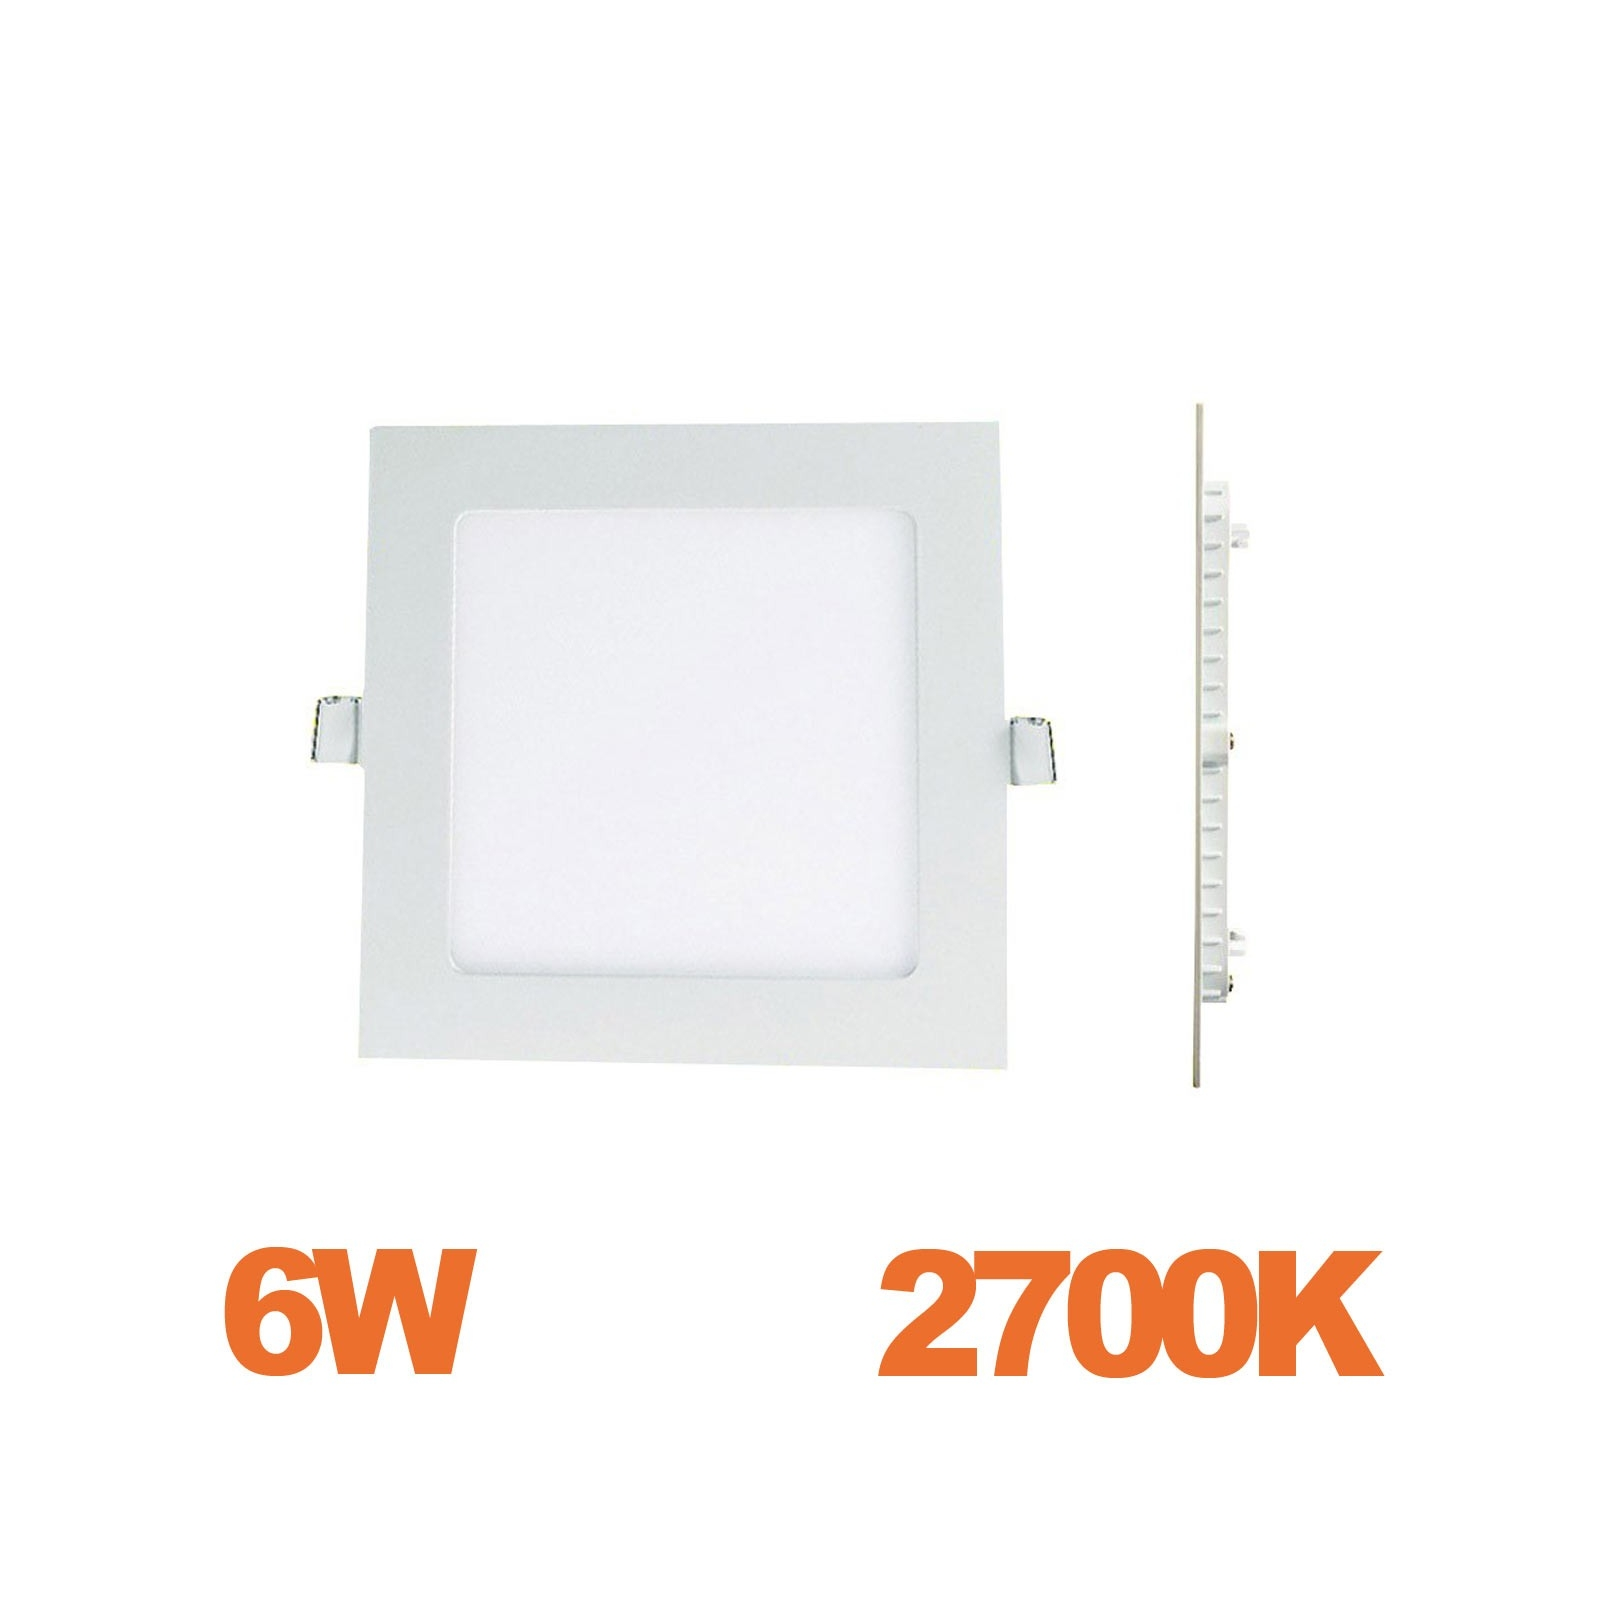 Spot Encastrable LED Carre Downlight Panel Extra-Plat 6W Blanc Chaud 2700k